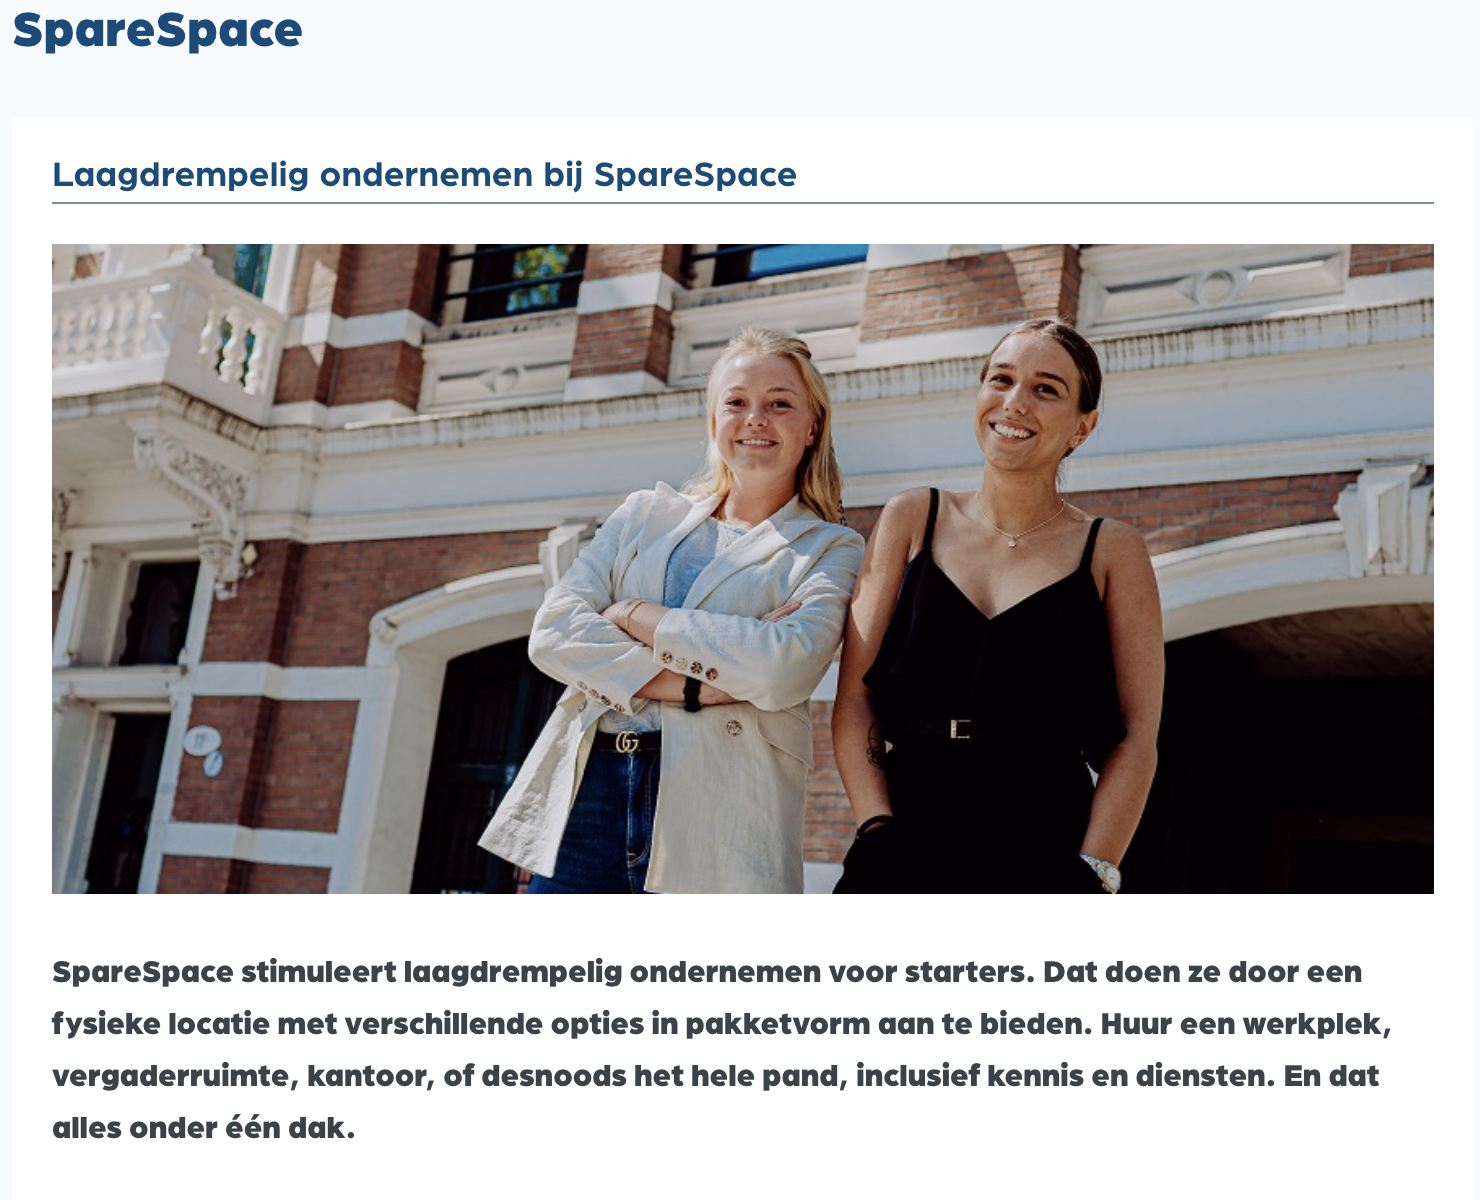 SpareSpace, Rotterdam